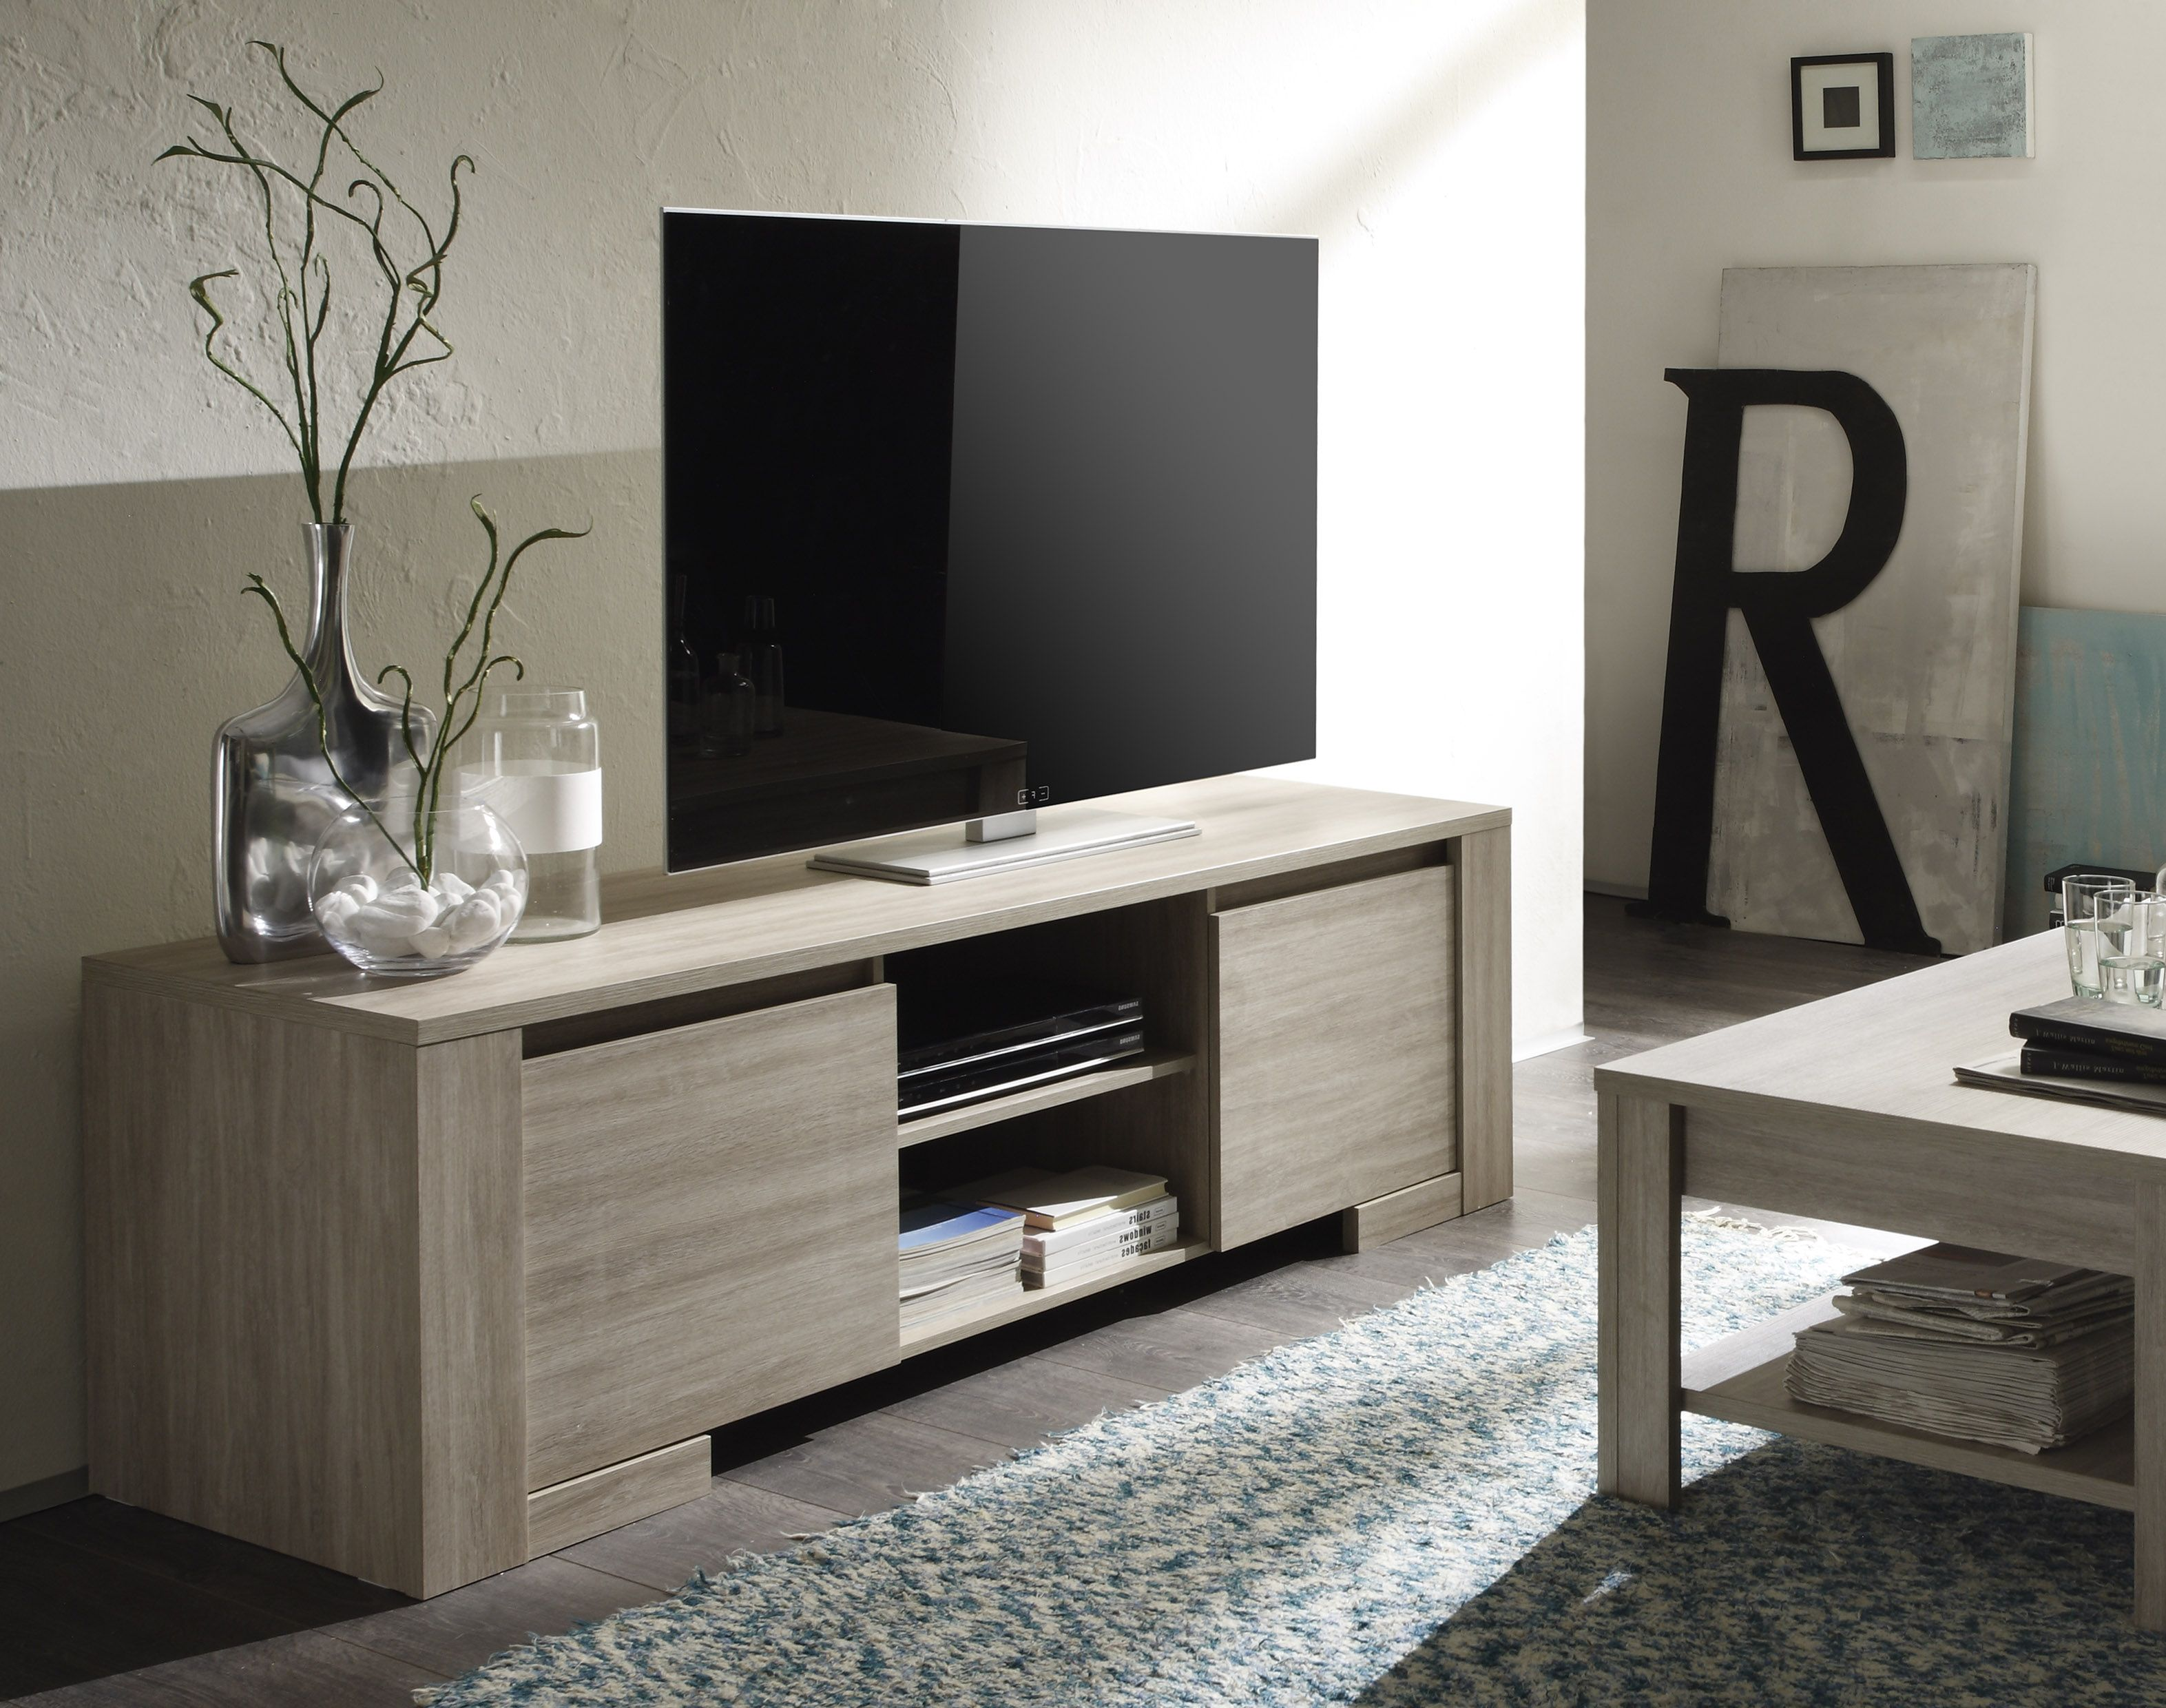 Licht Eiken Meubelen : Eiken kleurig tv meubel kopen meubeldeals